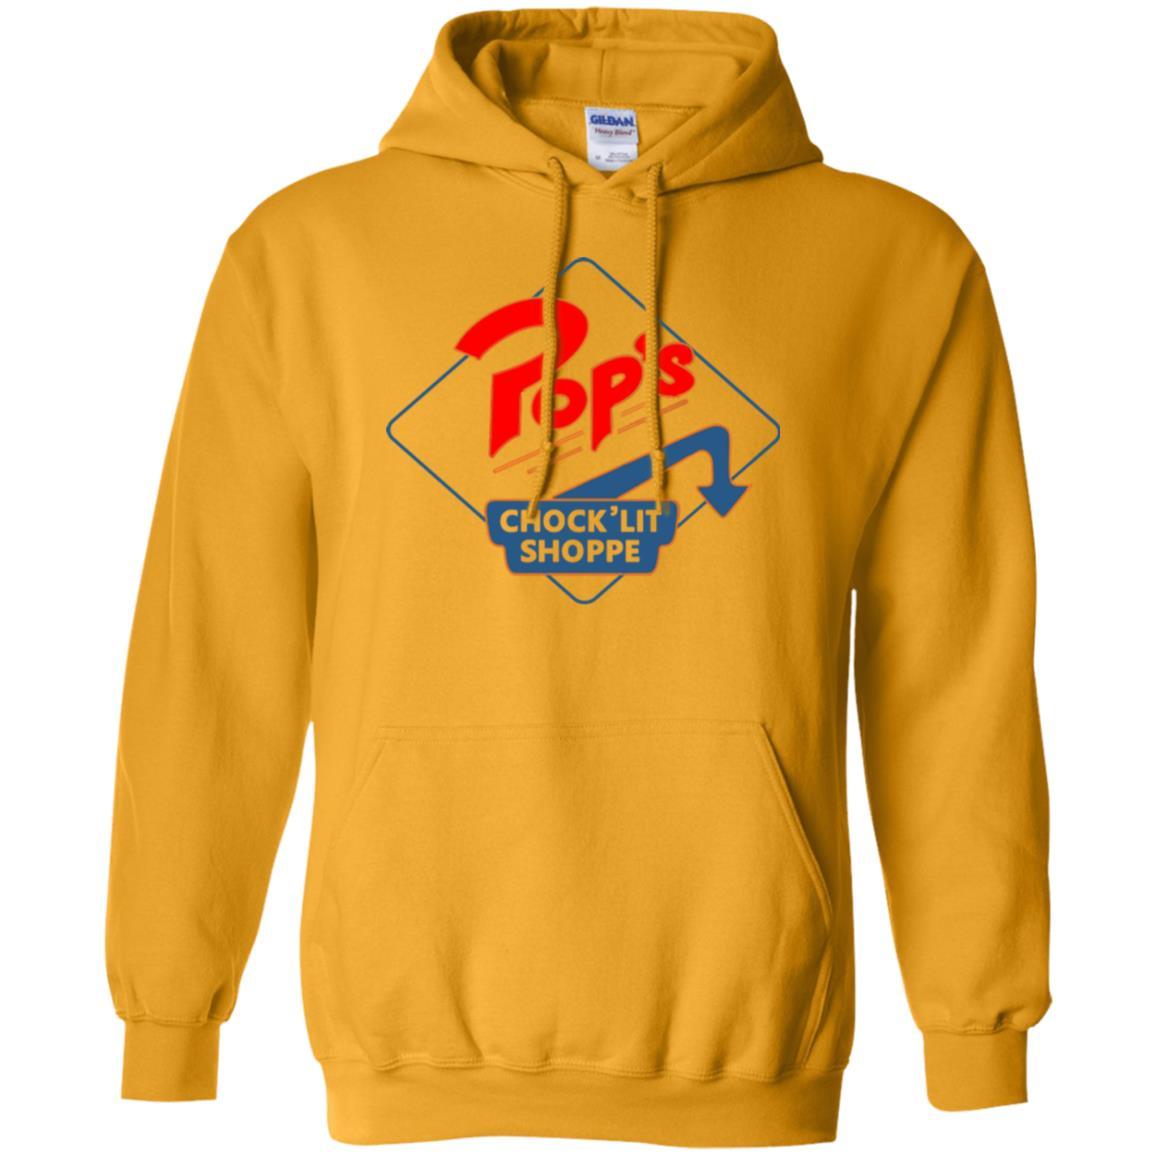 image 2087 - Riverdale Pop's Chock'lit Shoppe shirt